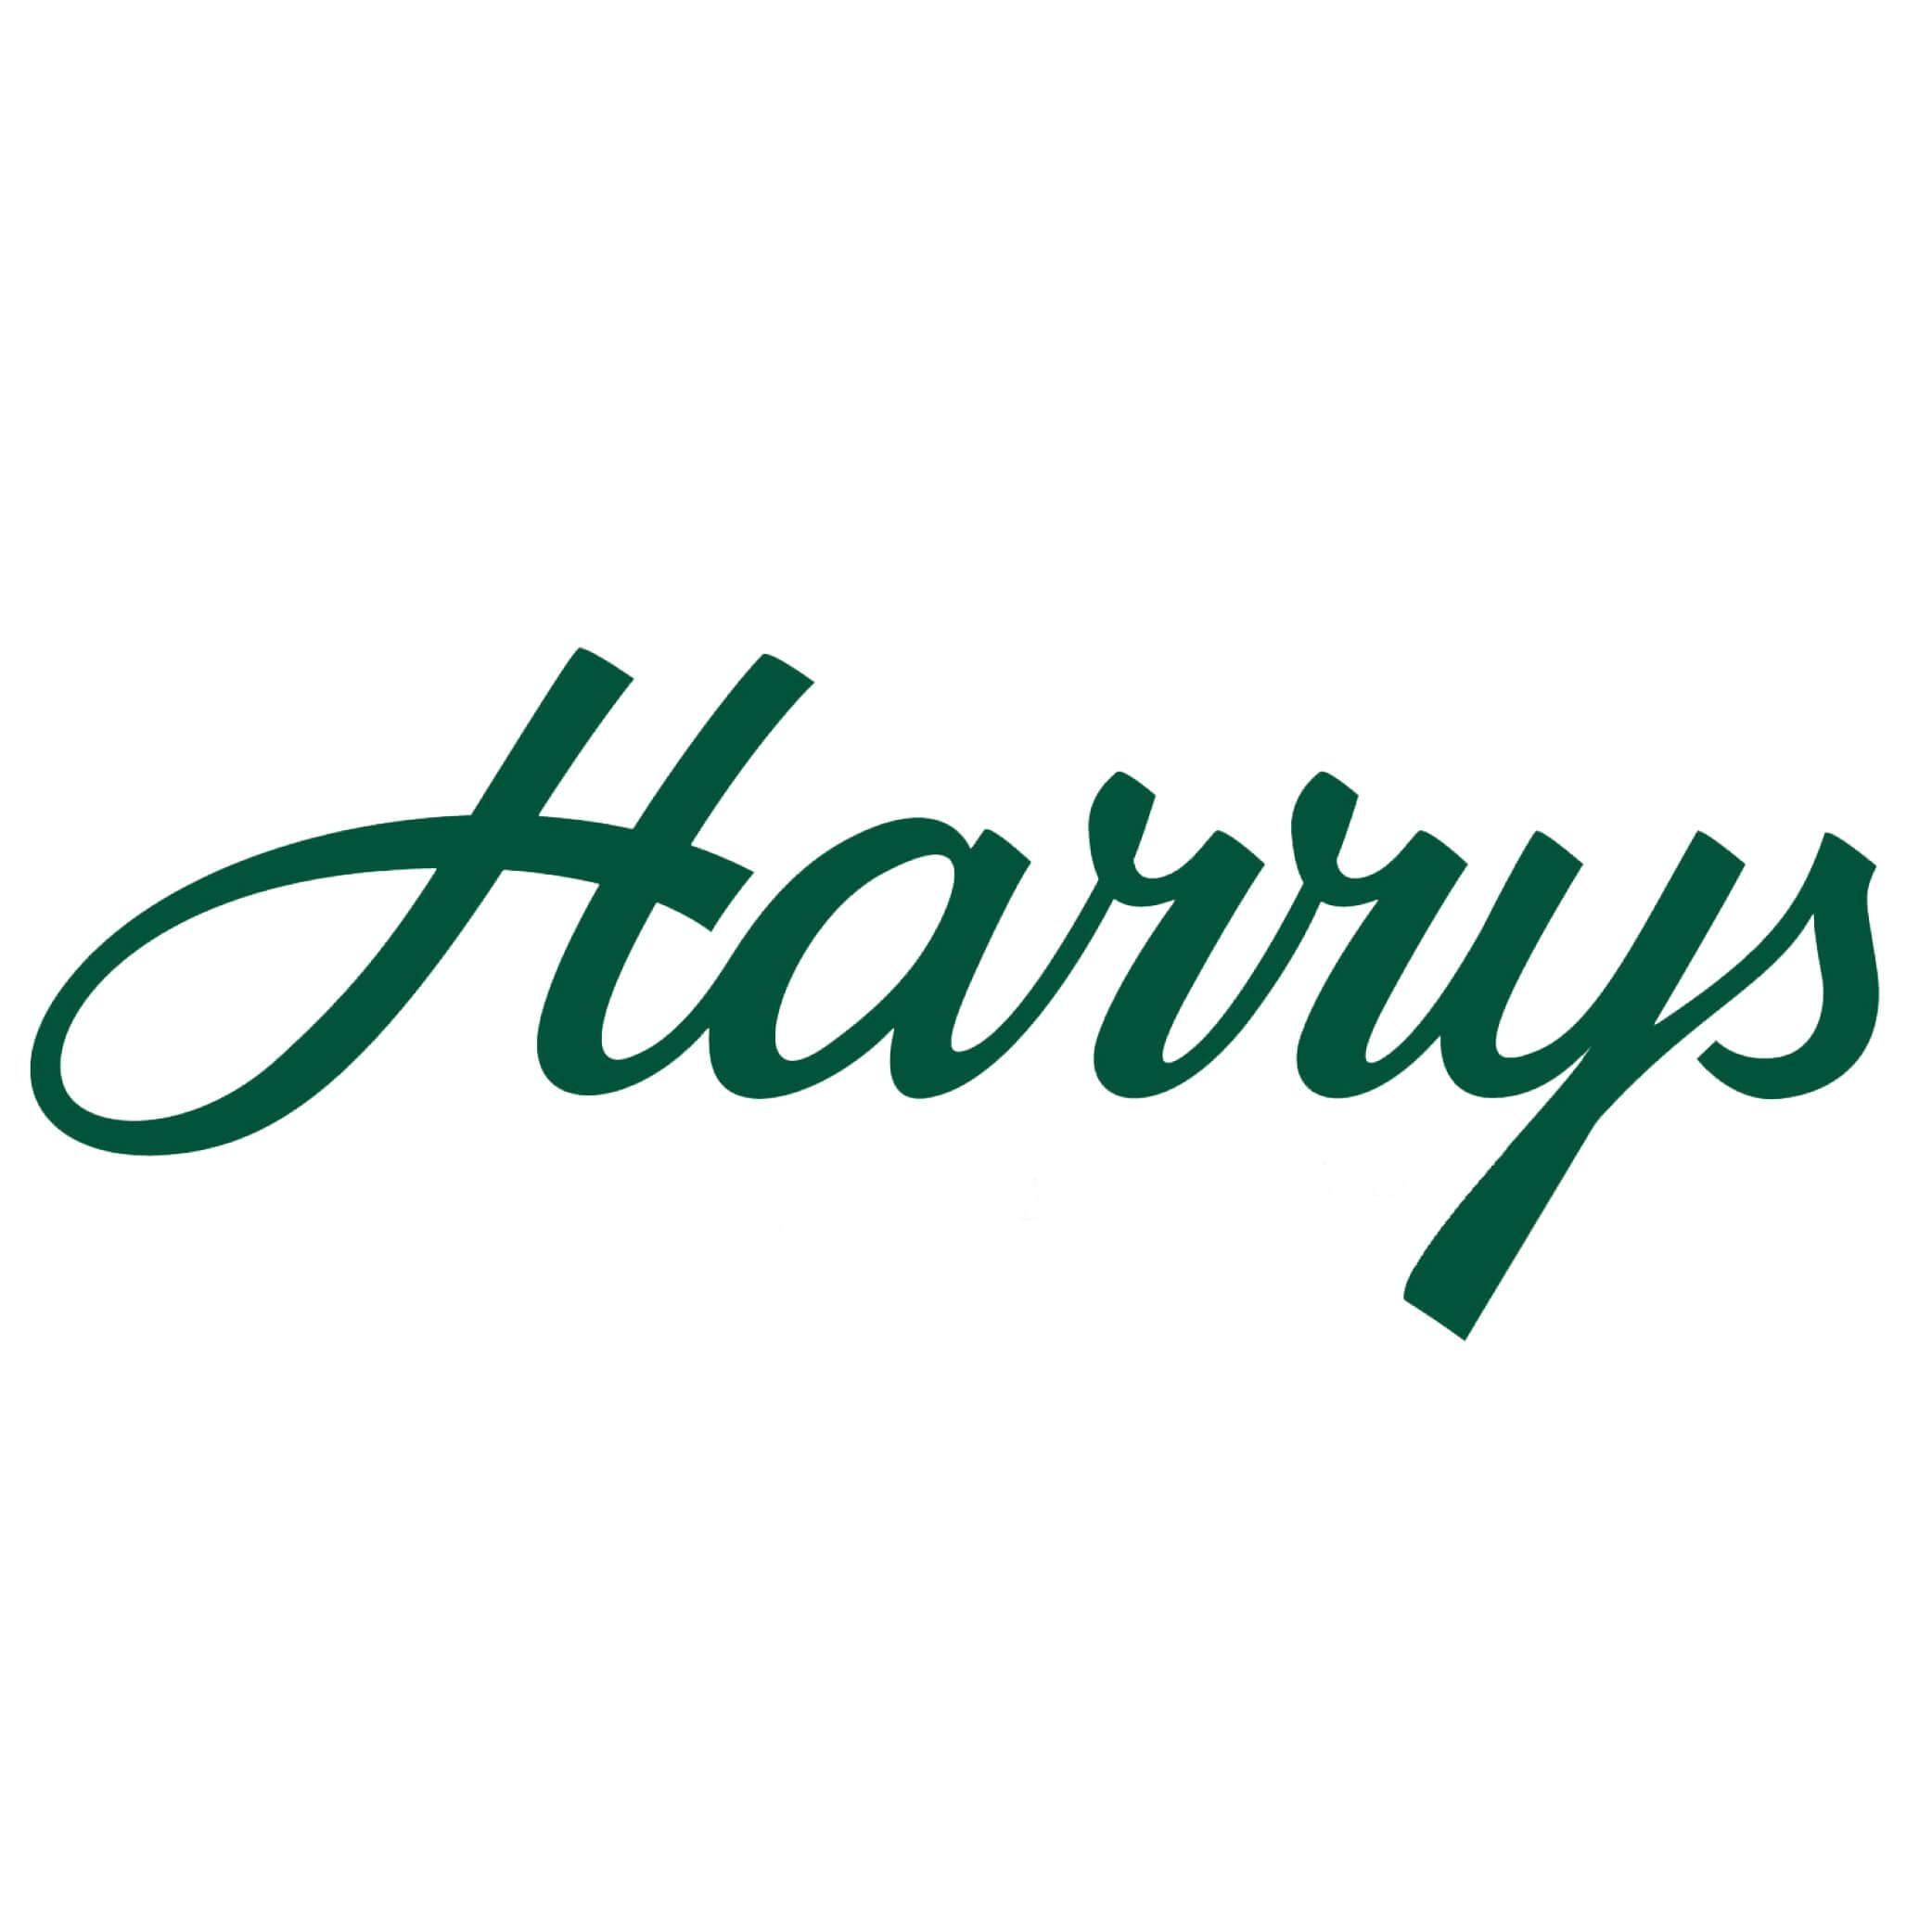 Harrys - Referenser